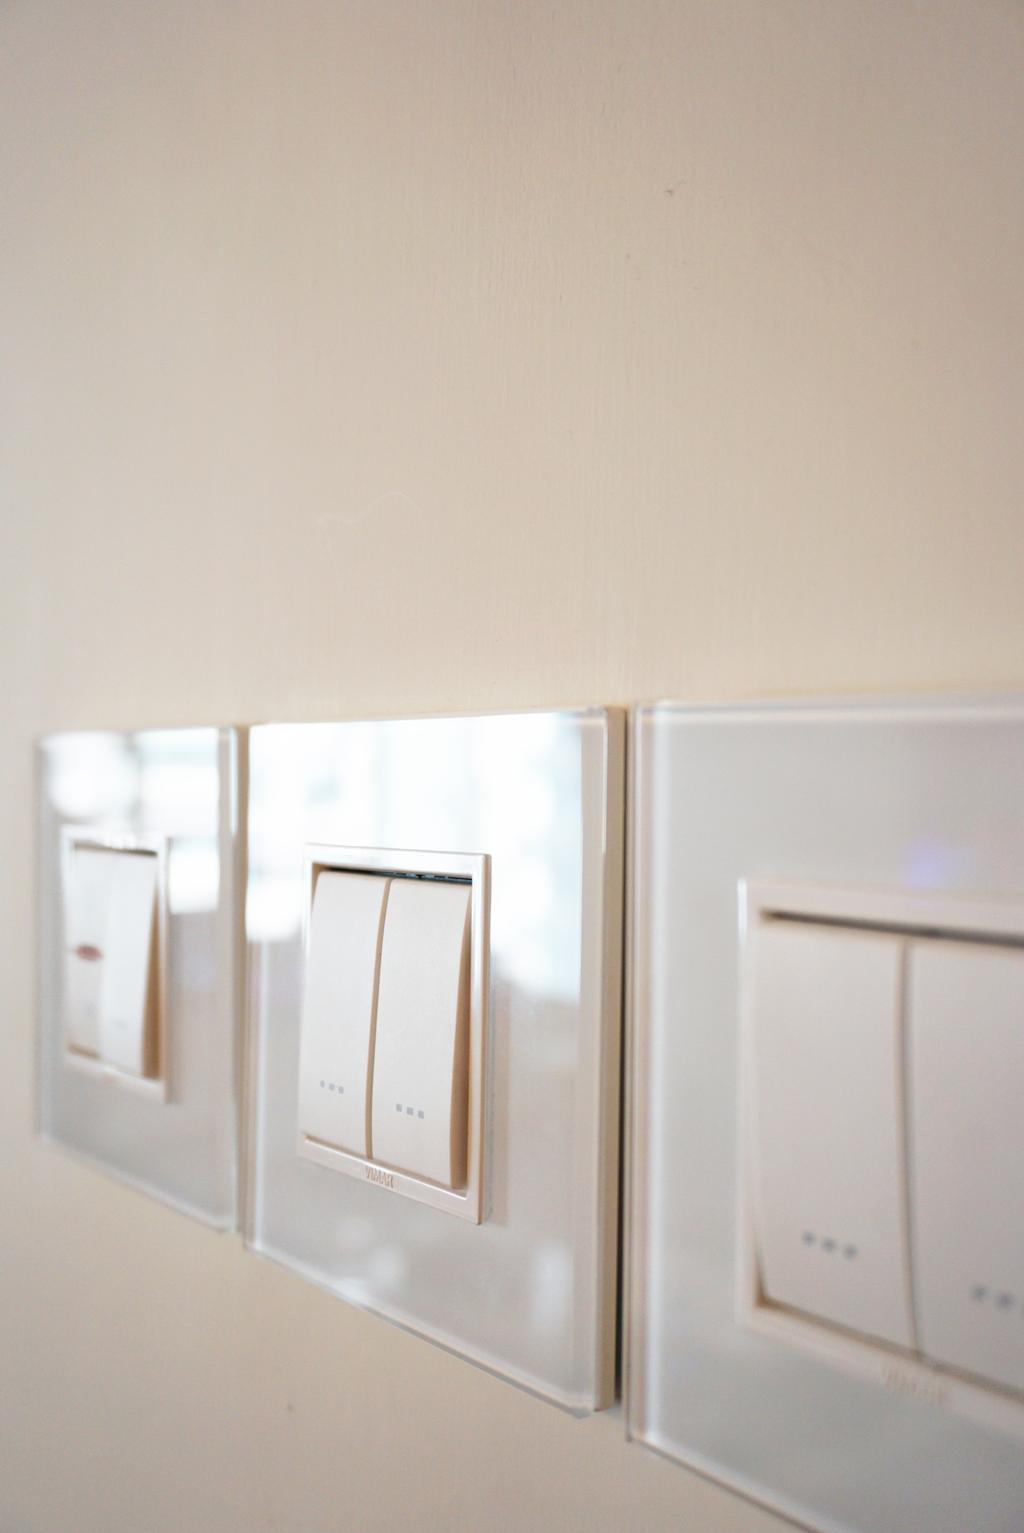 私家樓, 觀瀾雅軒, 室內設計師, AQUA Projects